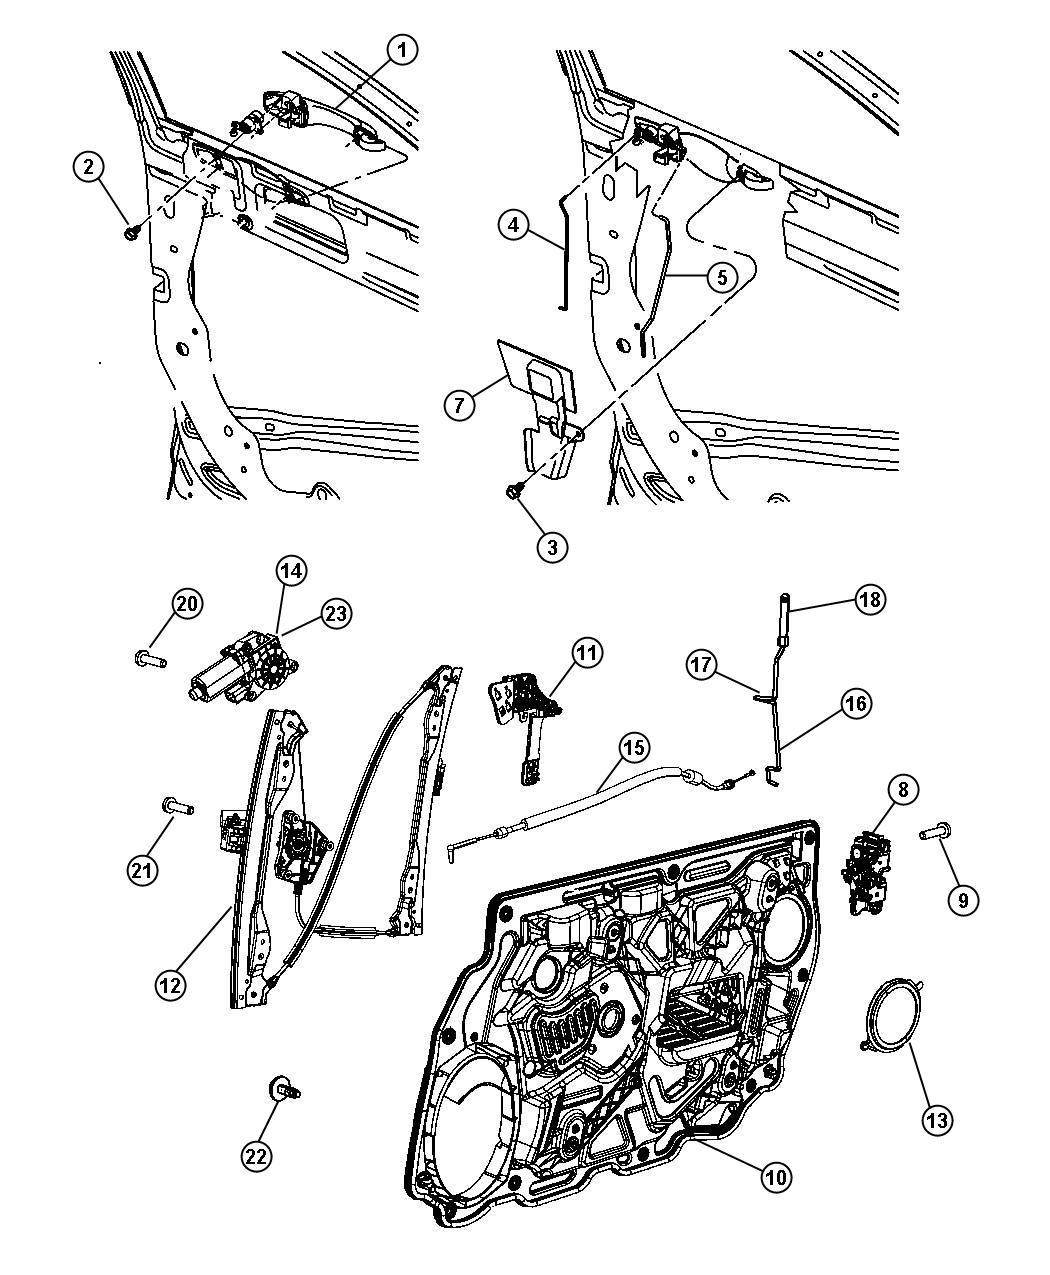 2008 Chrysler Sebring Latch Right Front Door Module 04589426ae Mopar Parts Inc Myrtle